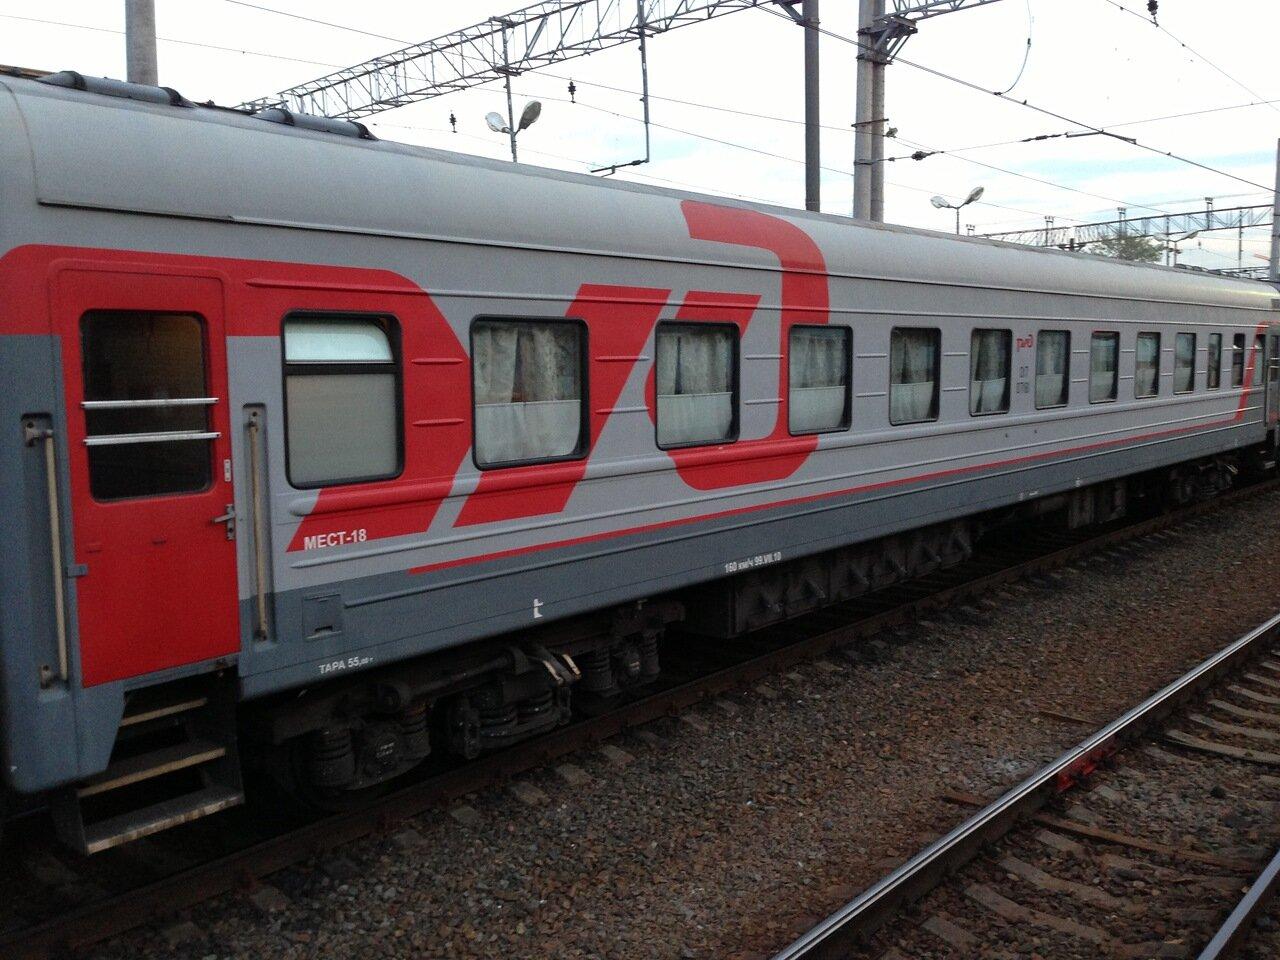 Фото купейный вагон поезд 350 москва анапа 2